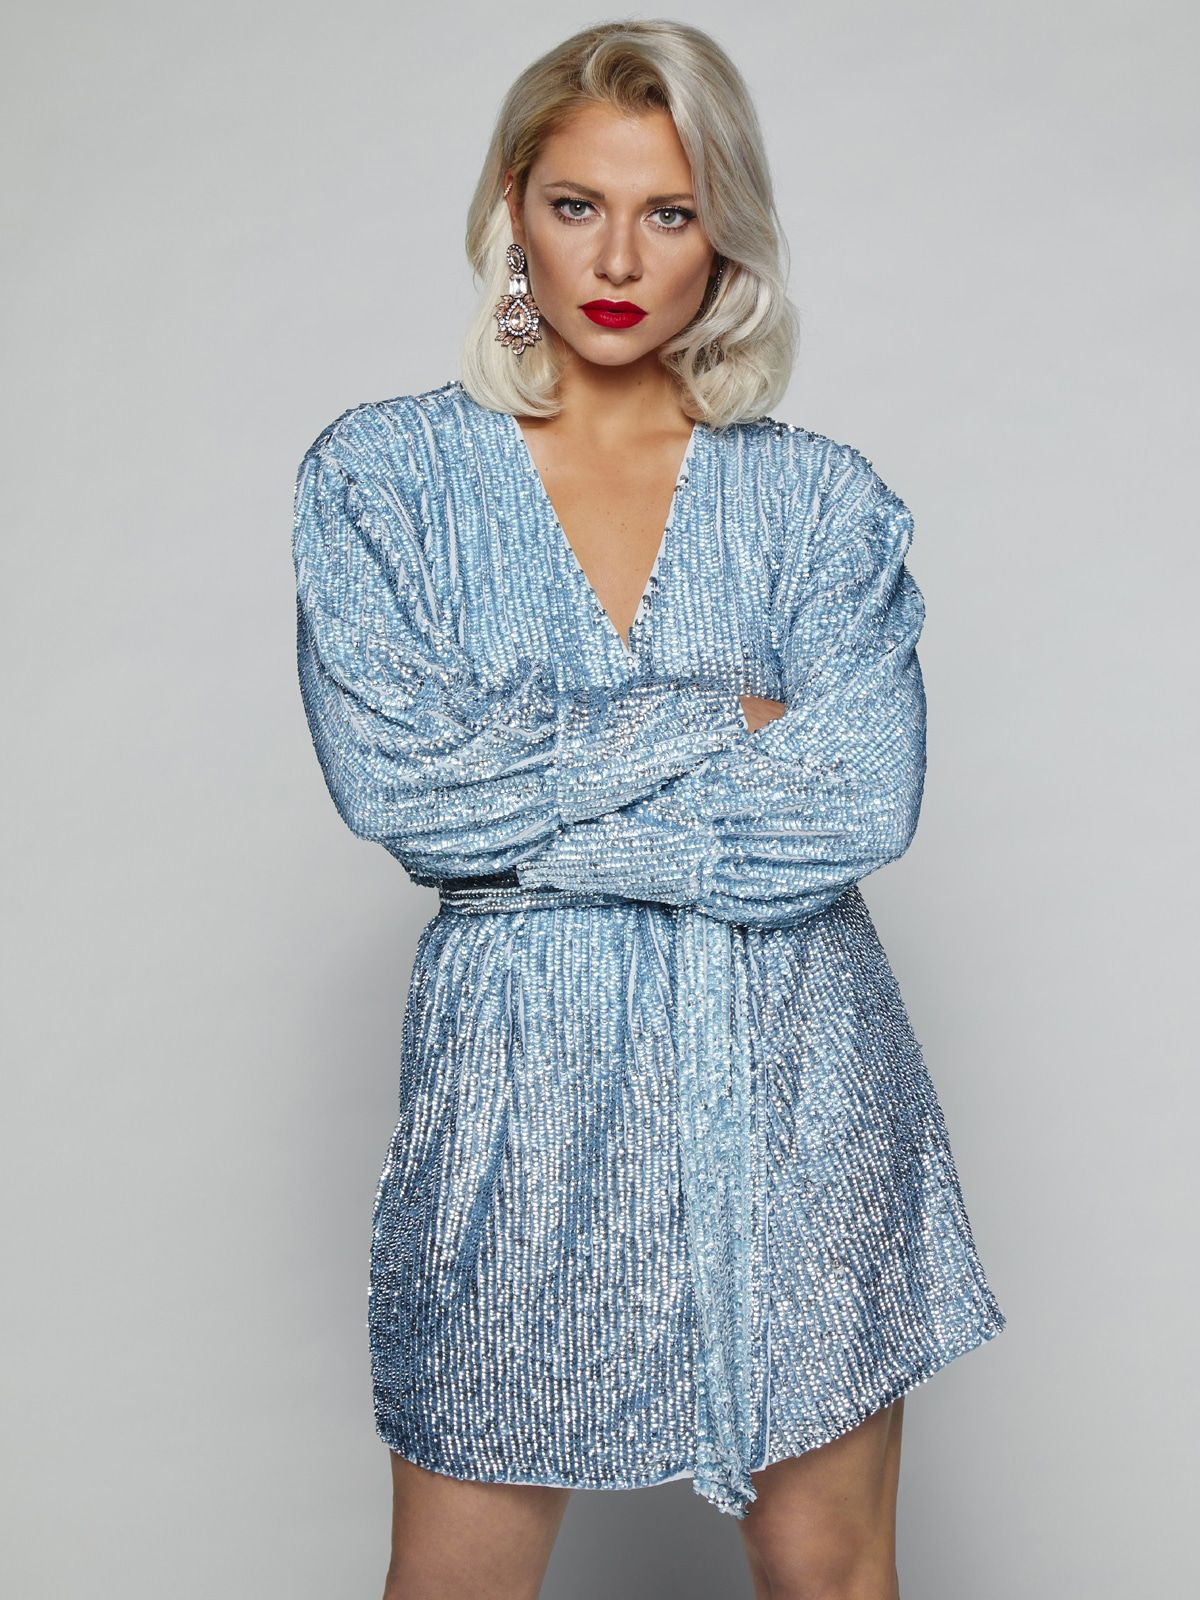 Best Dresses of the Day (874): Valentina Pahde bezaubert mit Eleganz